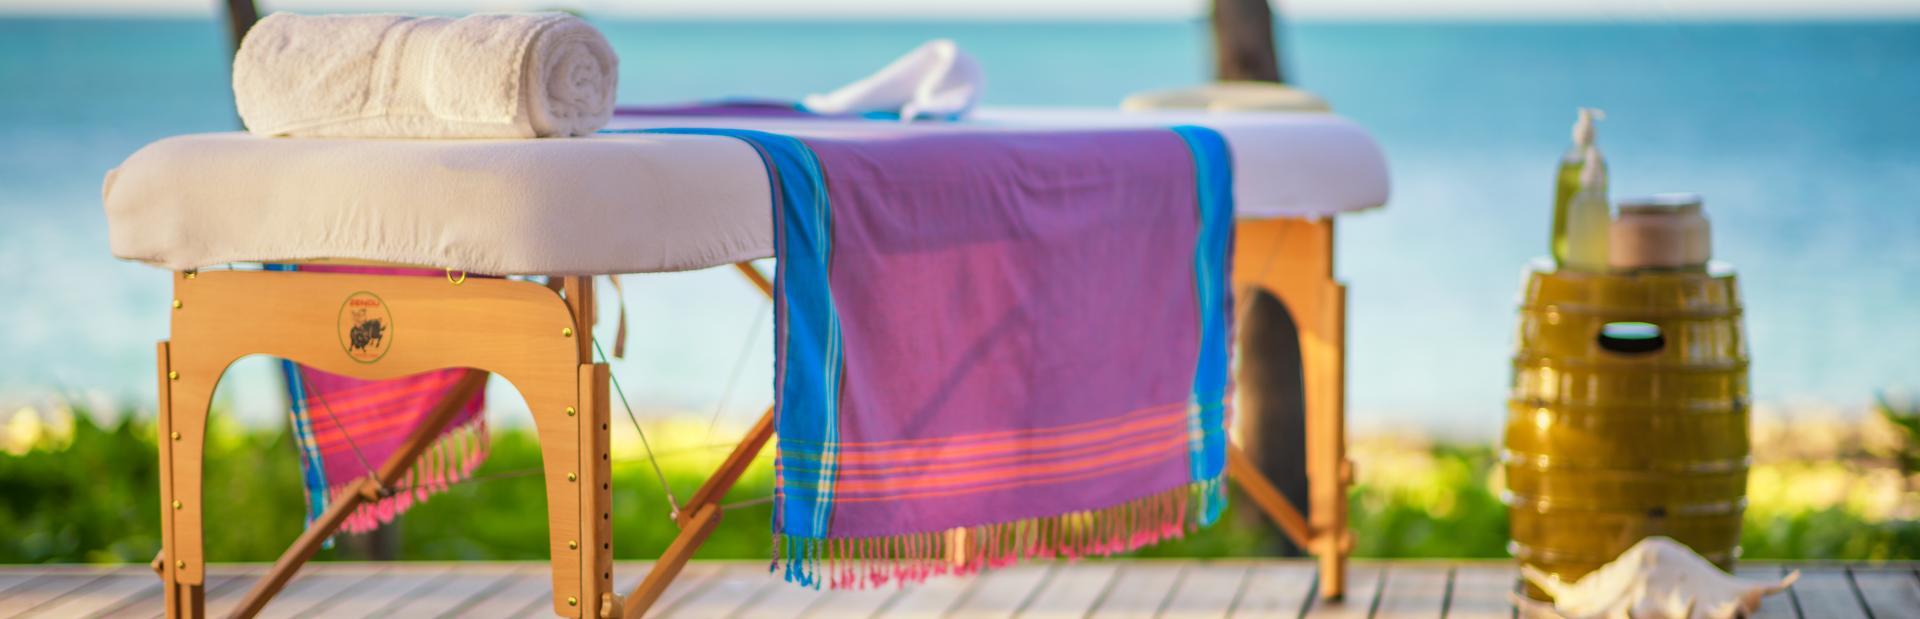 Thanda Spa Treatments Image 1